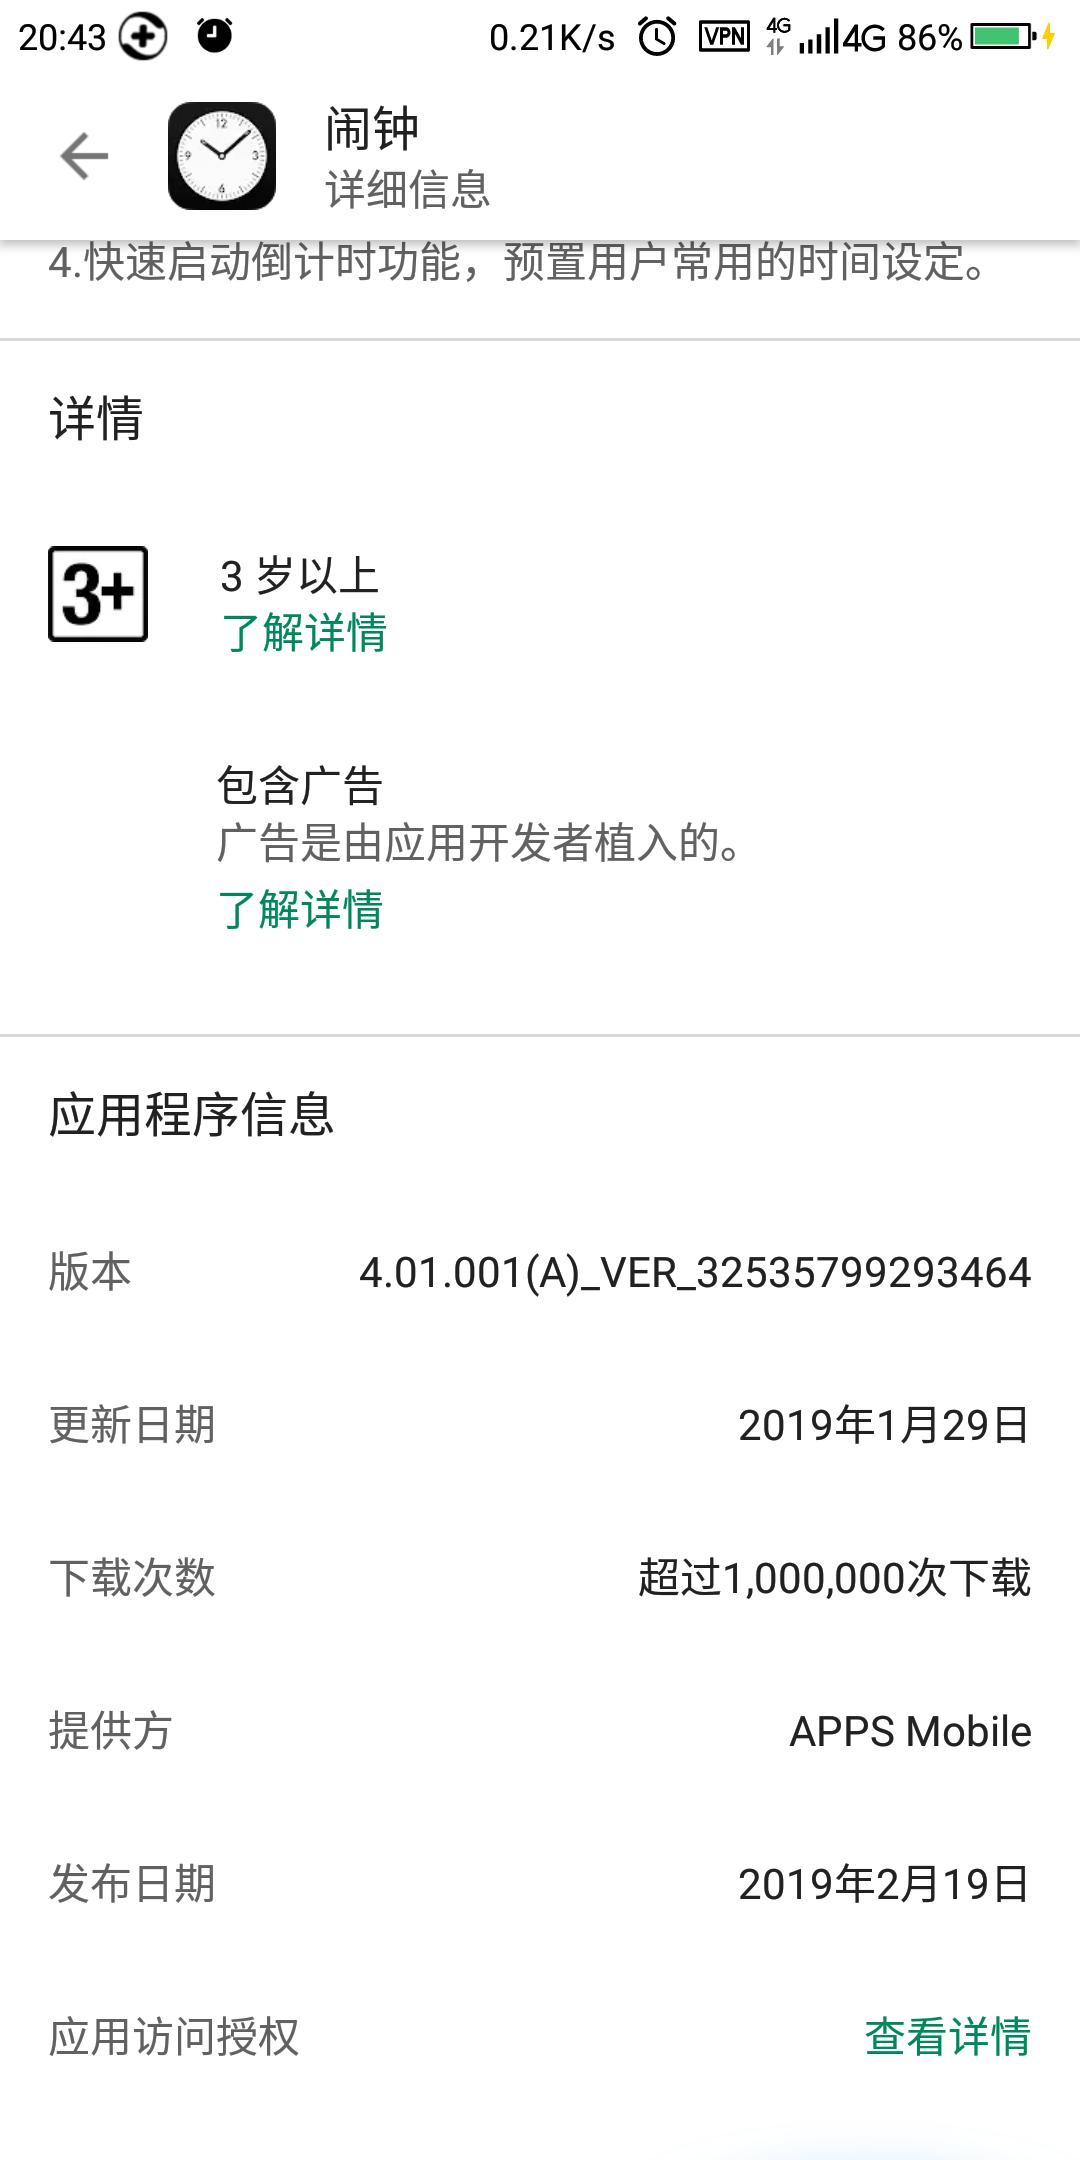 Screenshot_2019-03-18-20-43-59.png